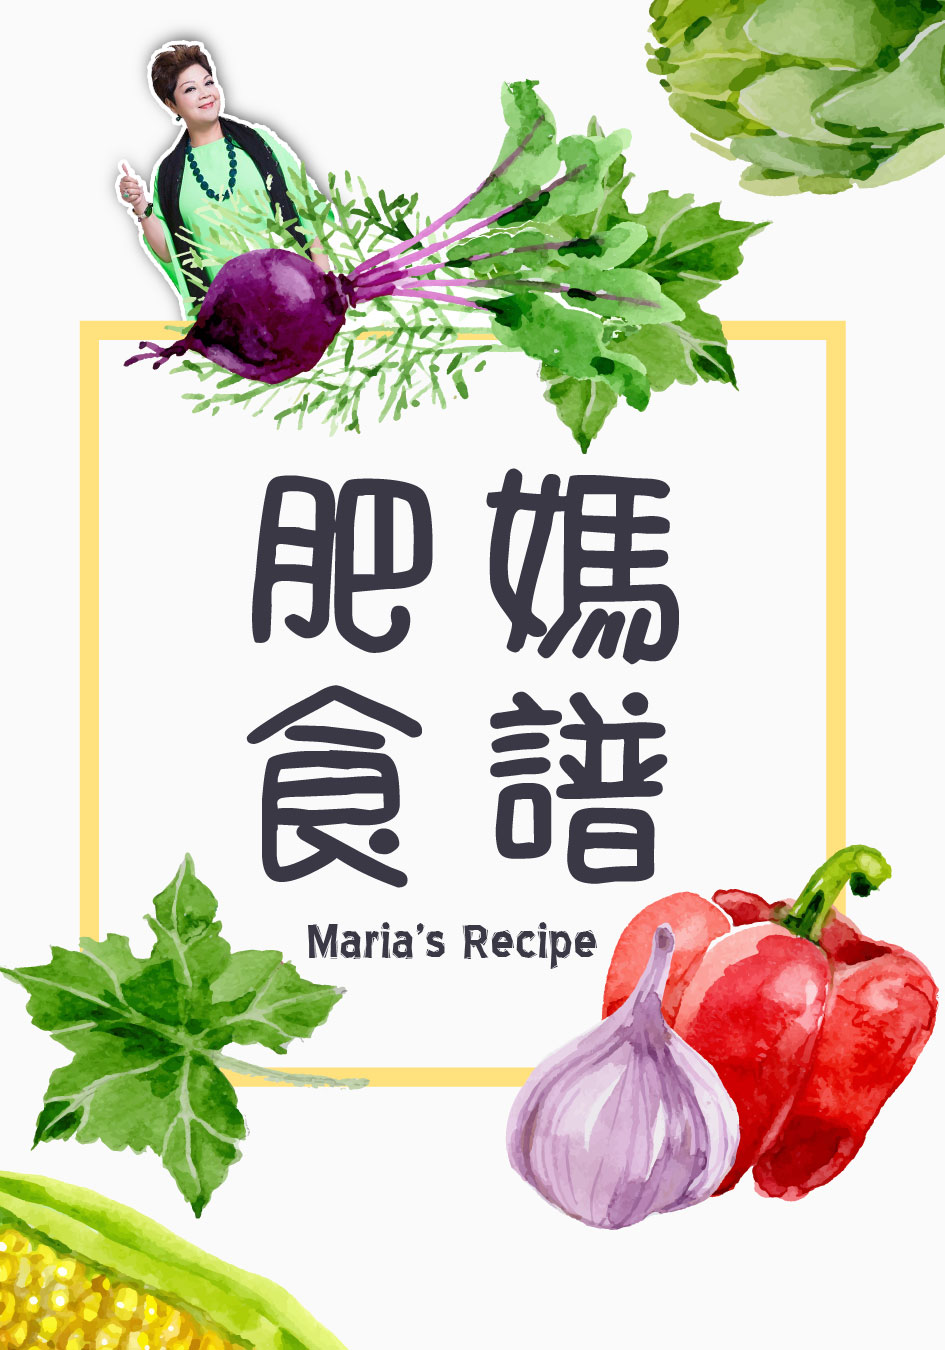 肥媽食譜 I-Maria's Recipes I